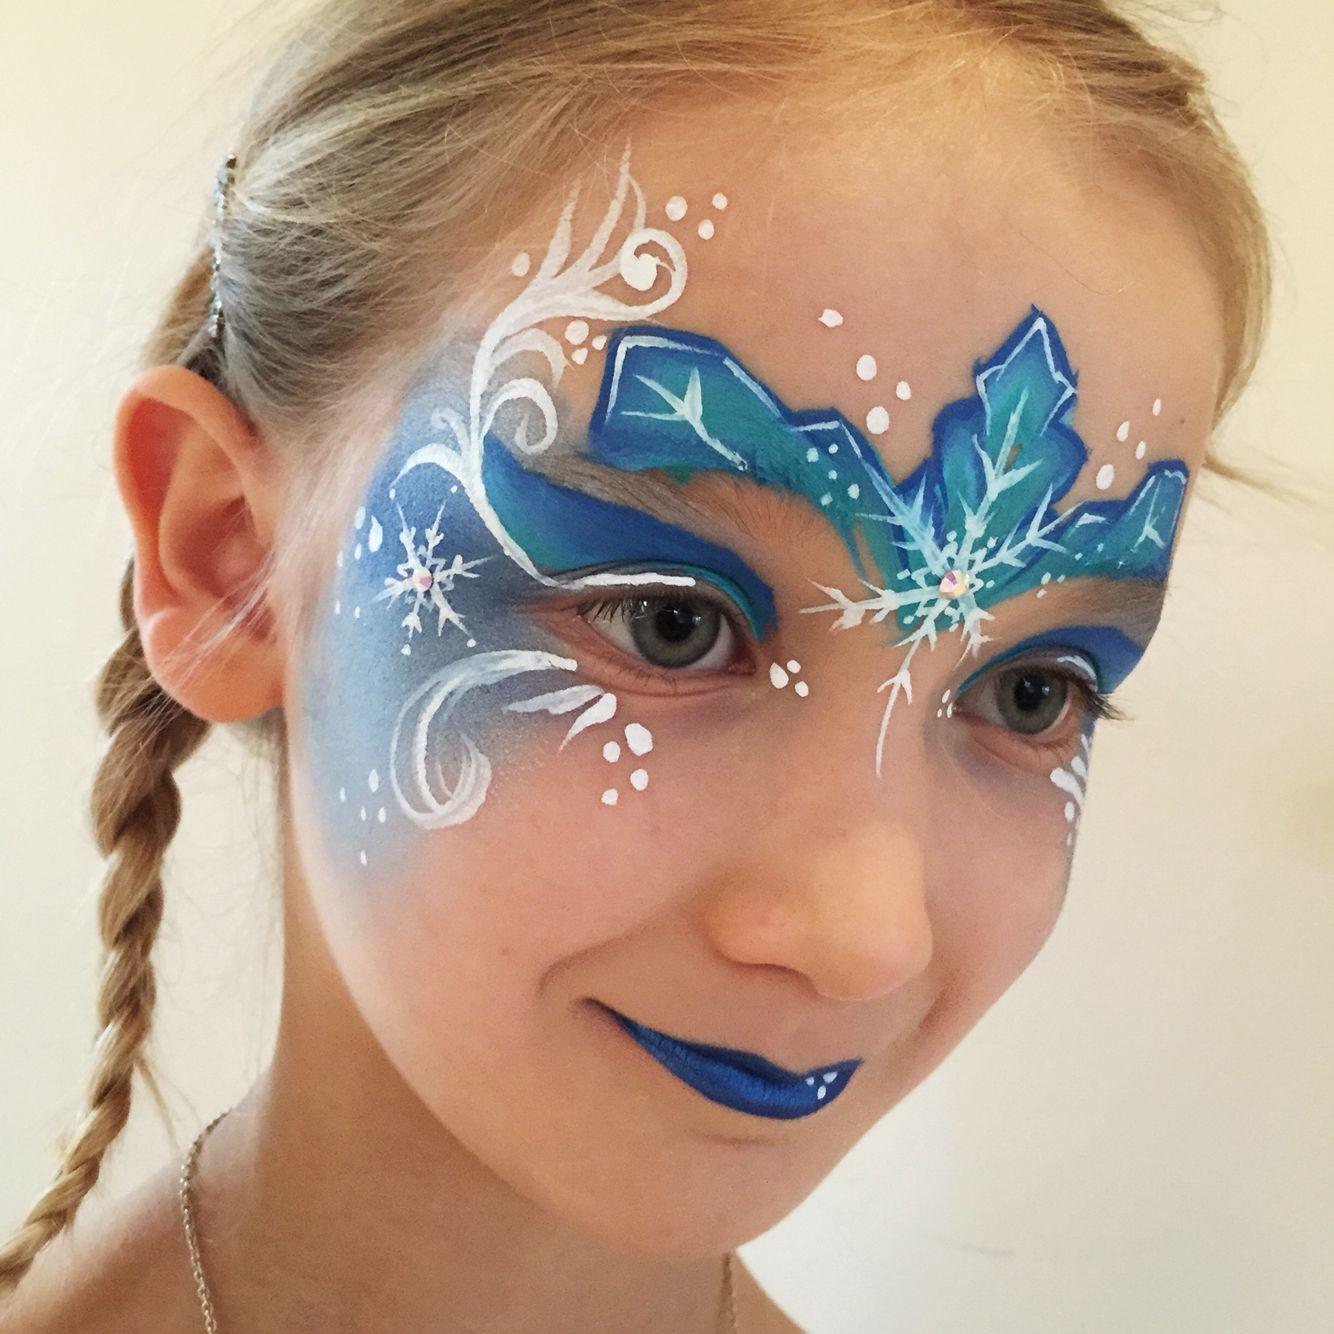 buzz lightyear face paint - Google Search   facepainting   Pinterest ...